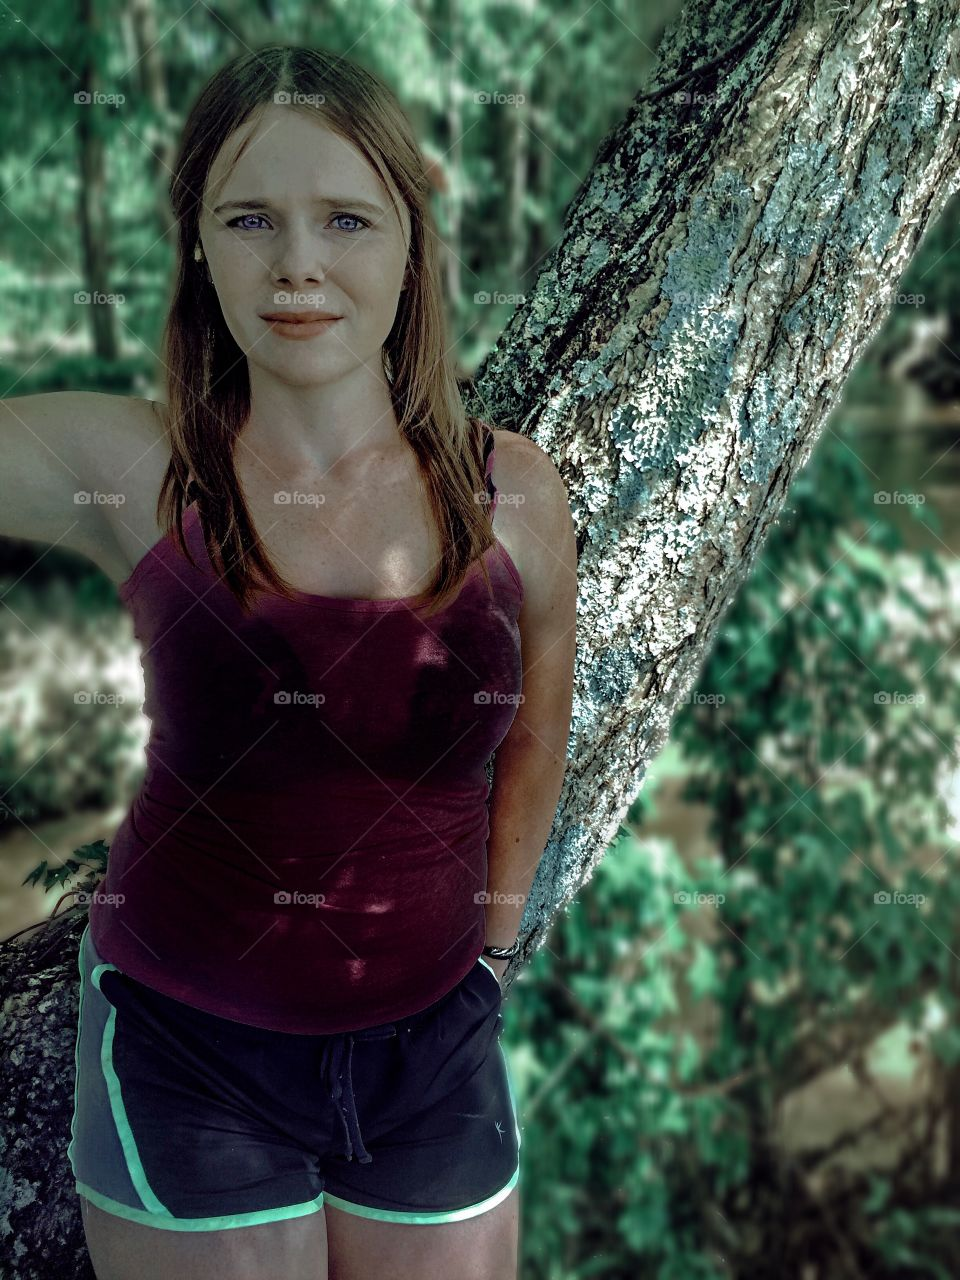 Sad teenage girl standing in front of tree